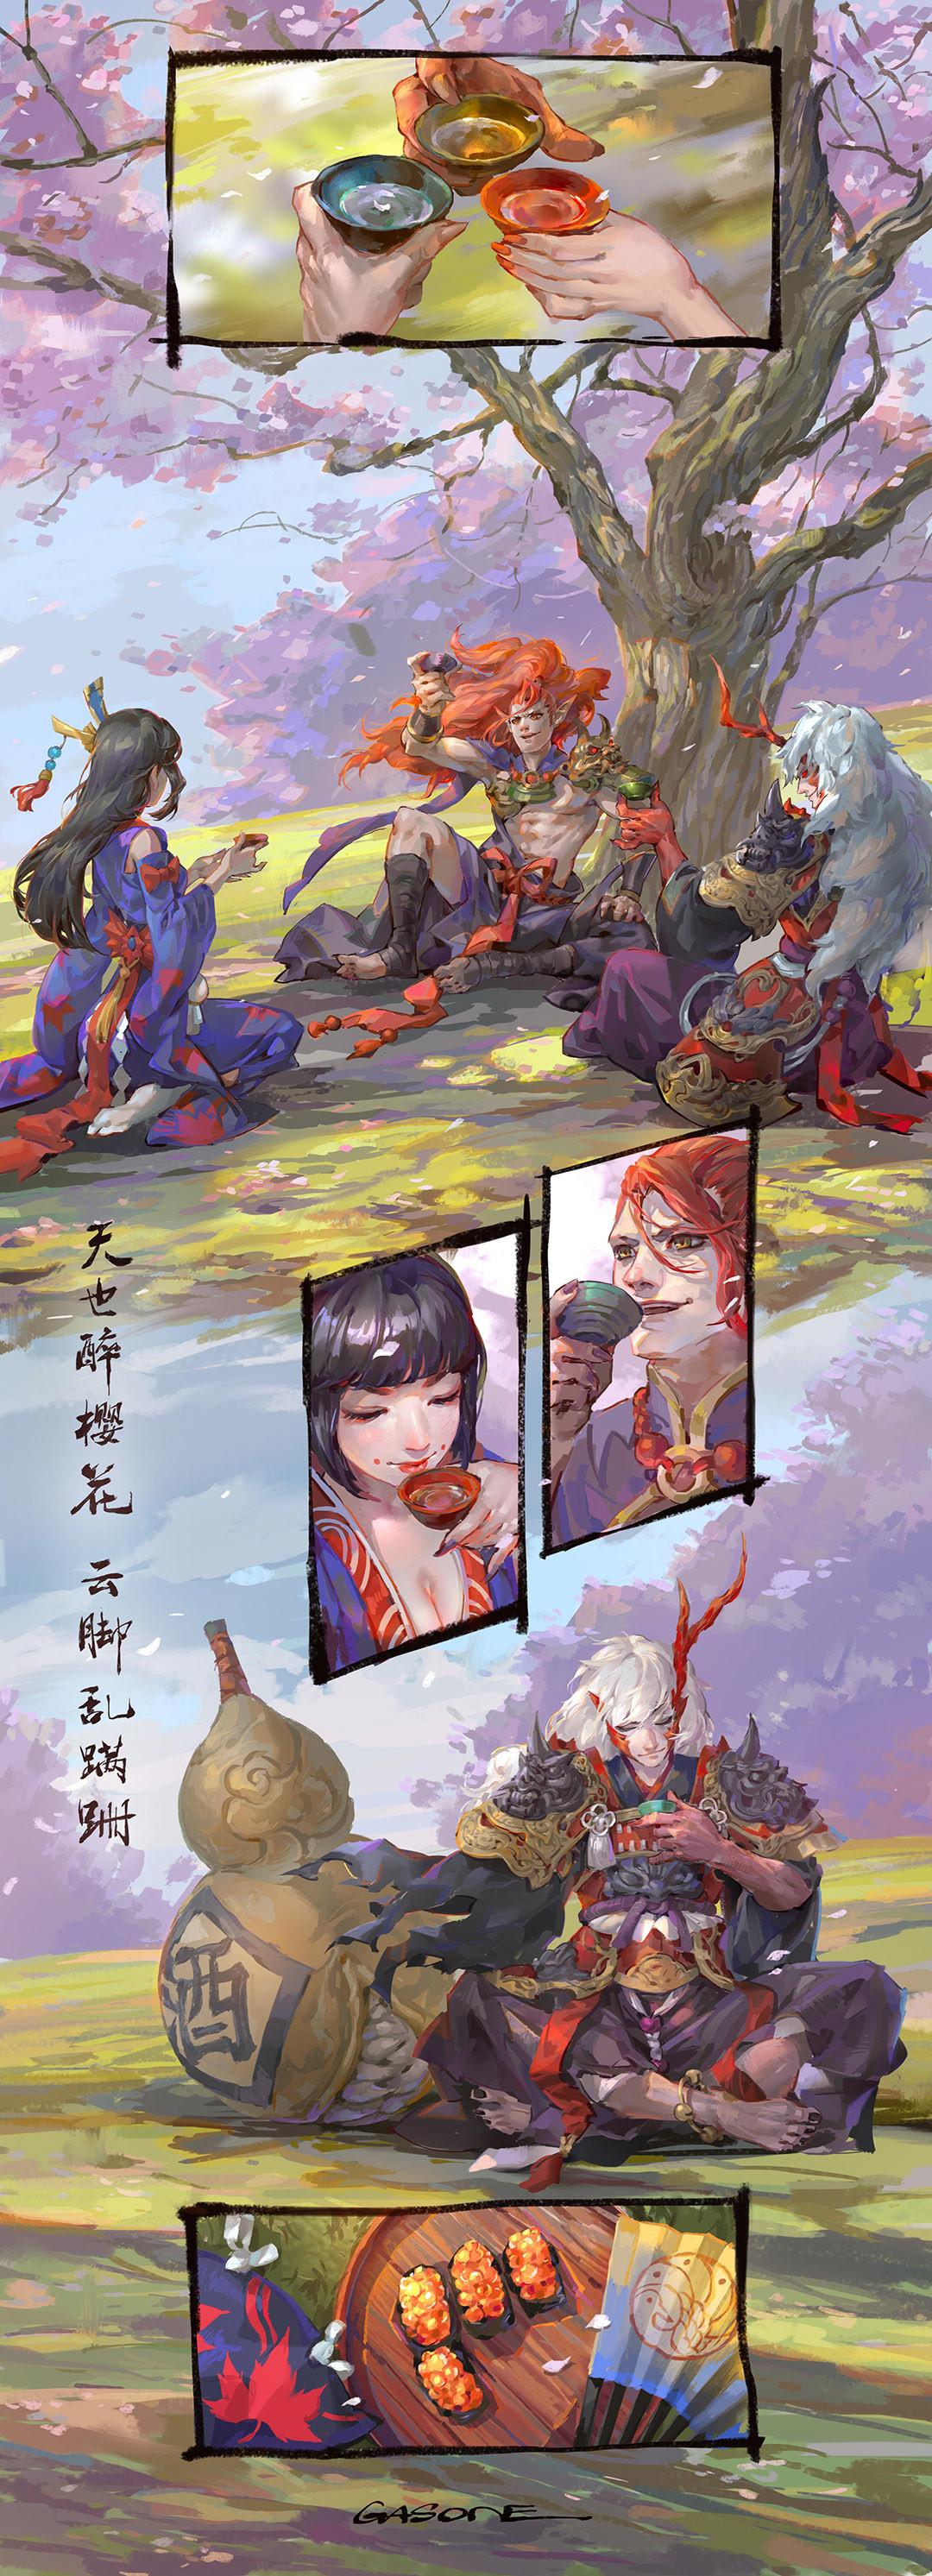 Shengyi sun 1080